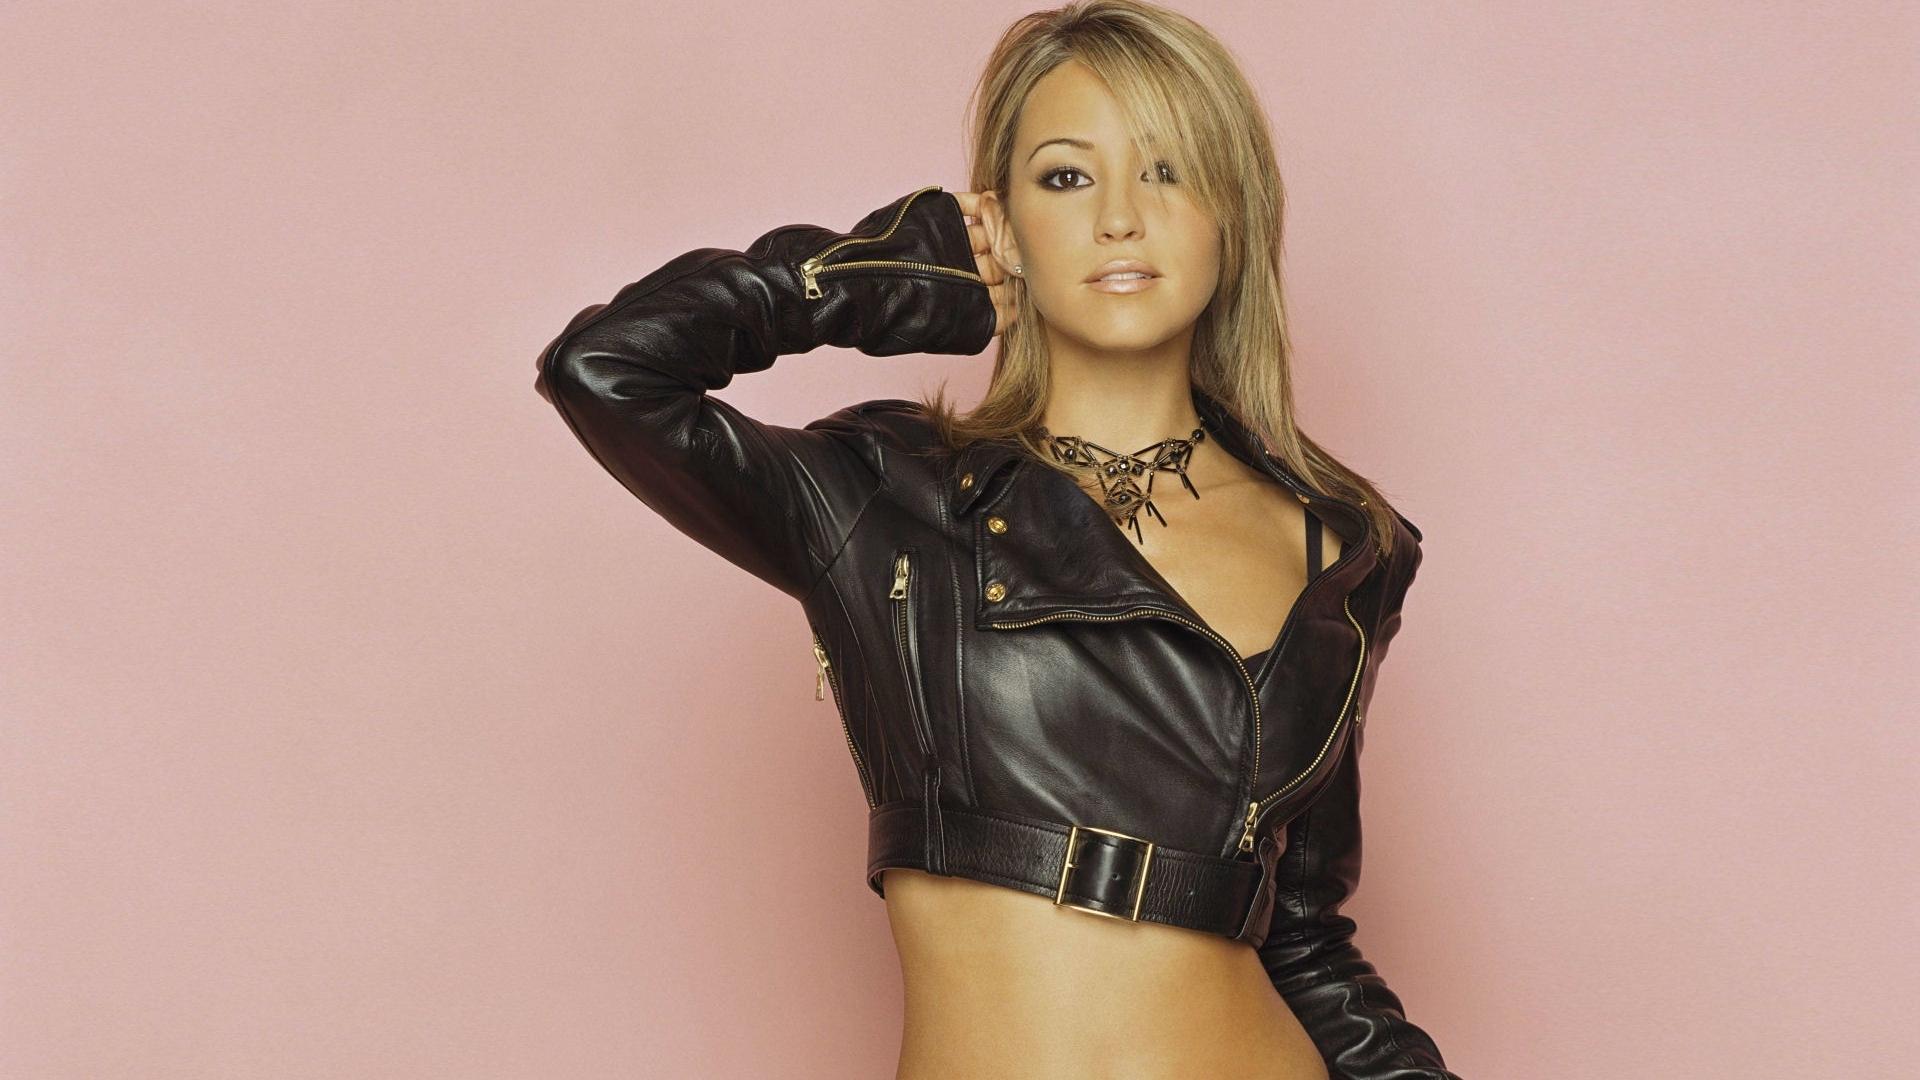 Leather jacket photoshoot - Rachel Stevens Blonde Leather Jacket